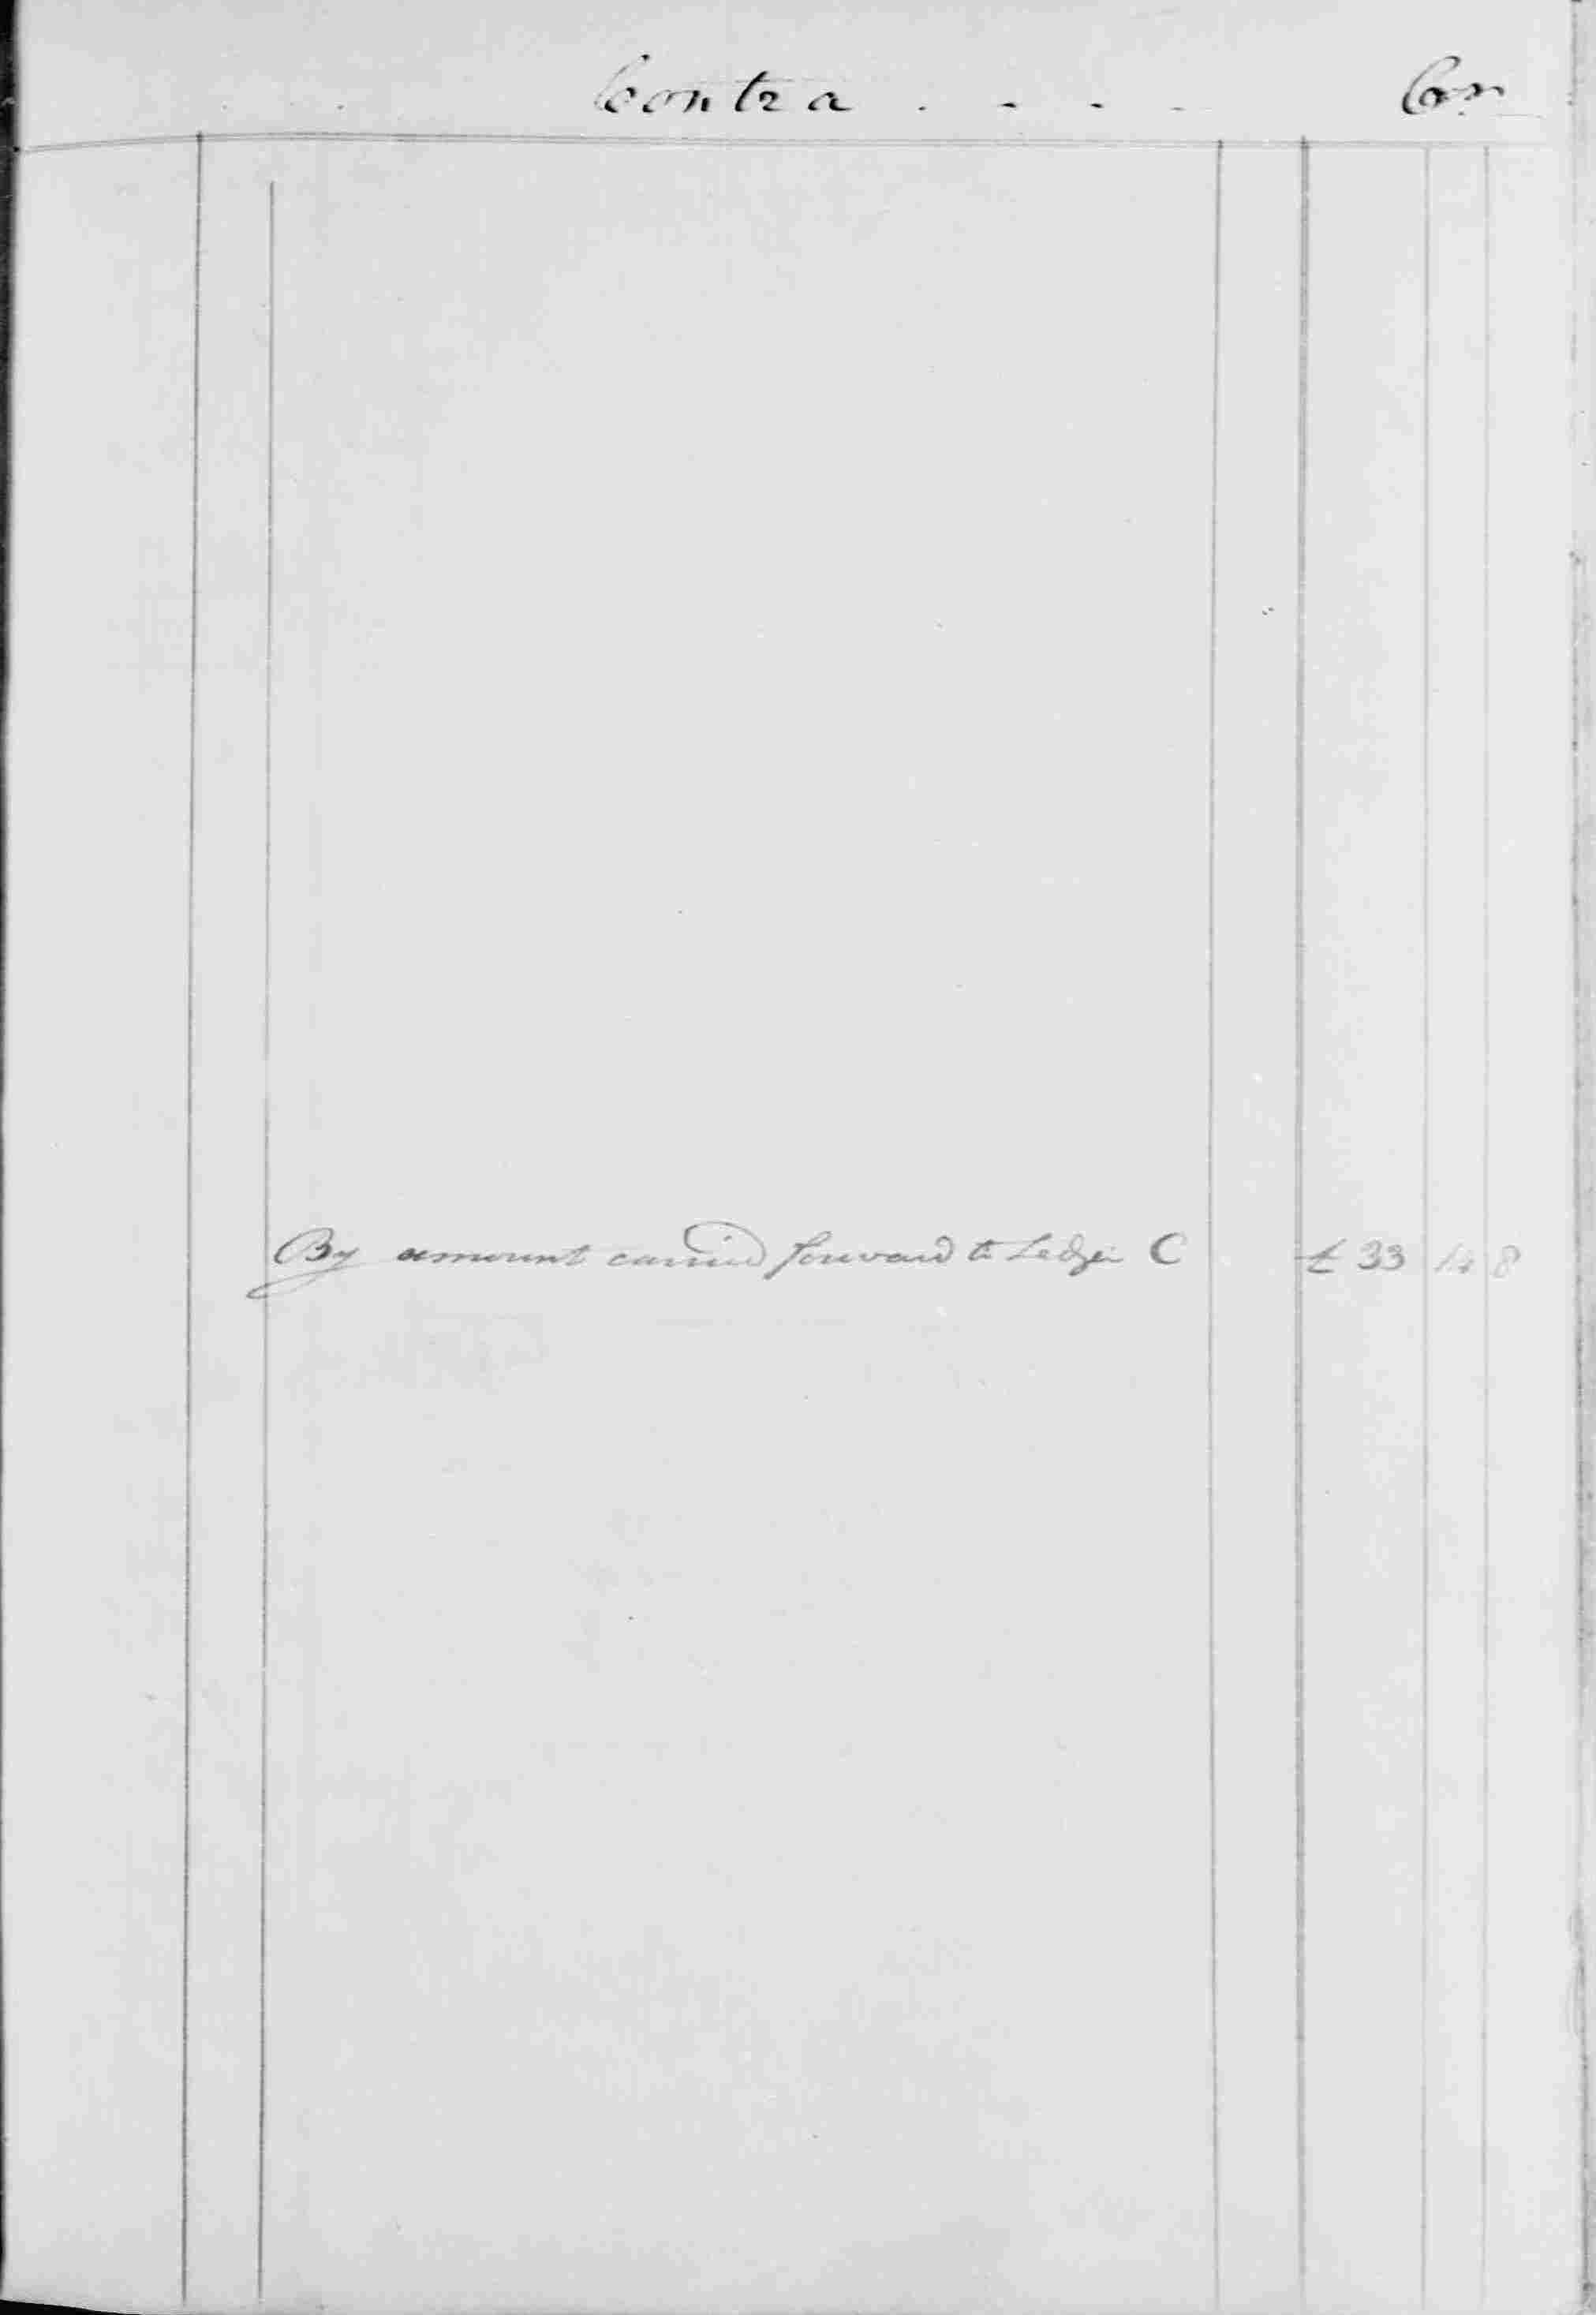 Ledger B, folio 352, right side